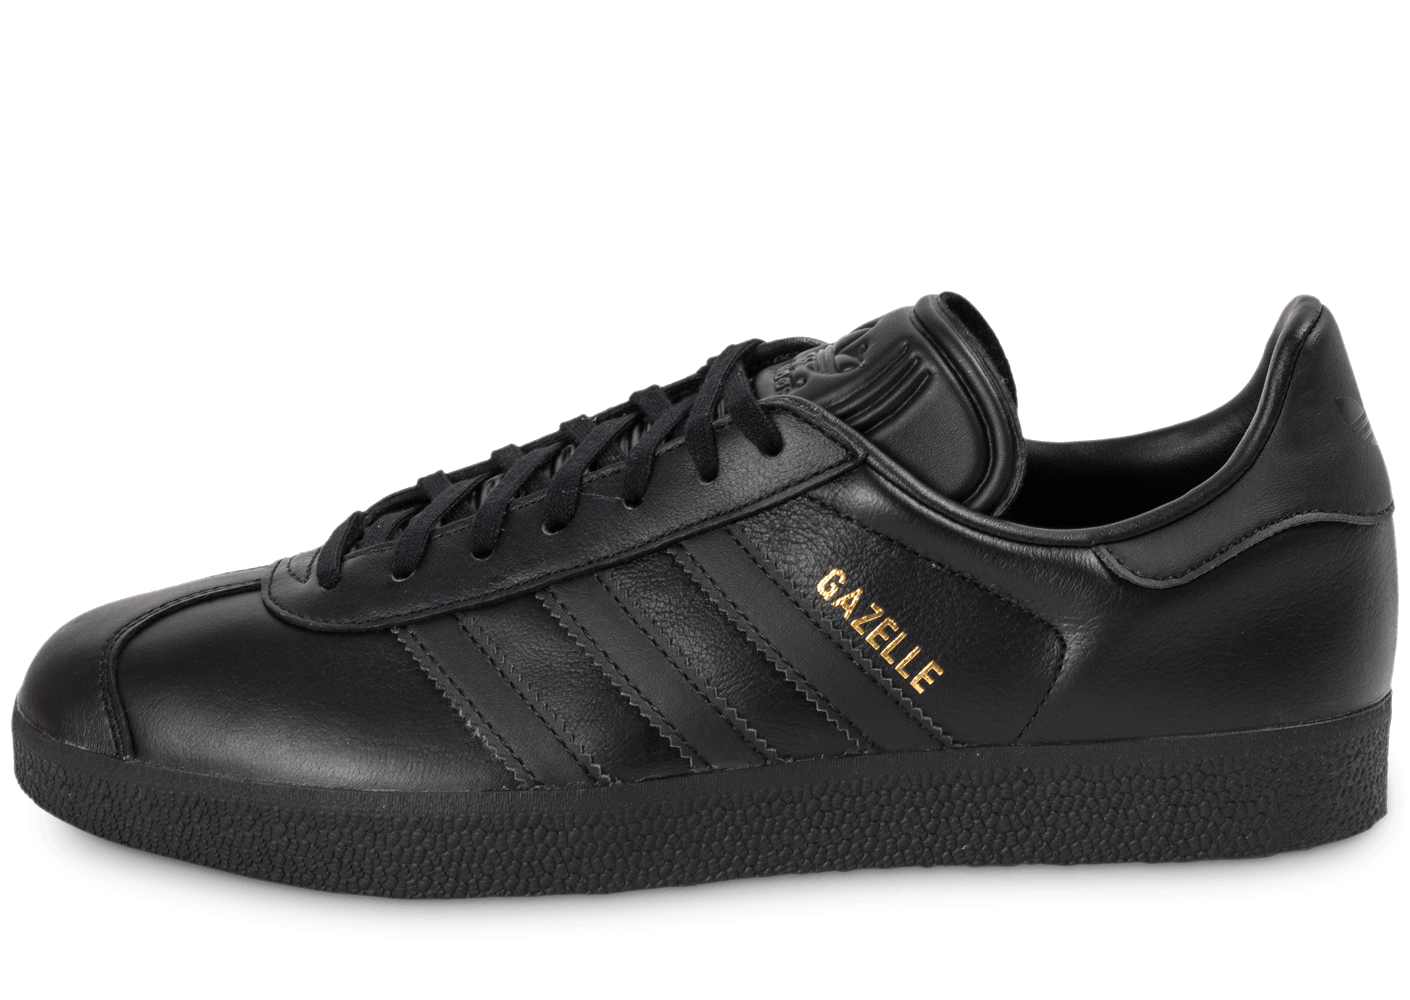 promo code 3bcab 2a6f7 Acheter adidas gazelle cuir pas cher